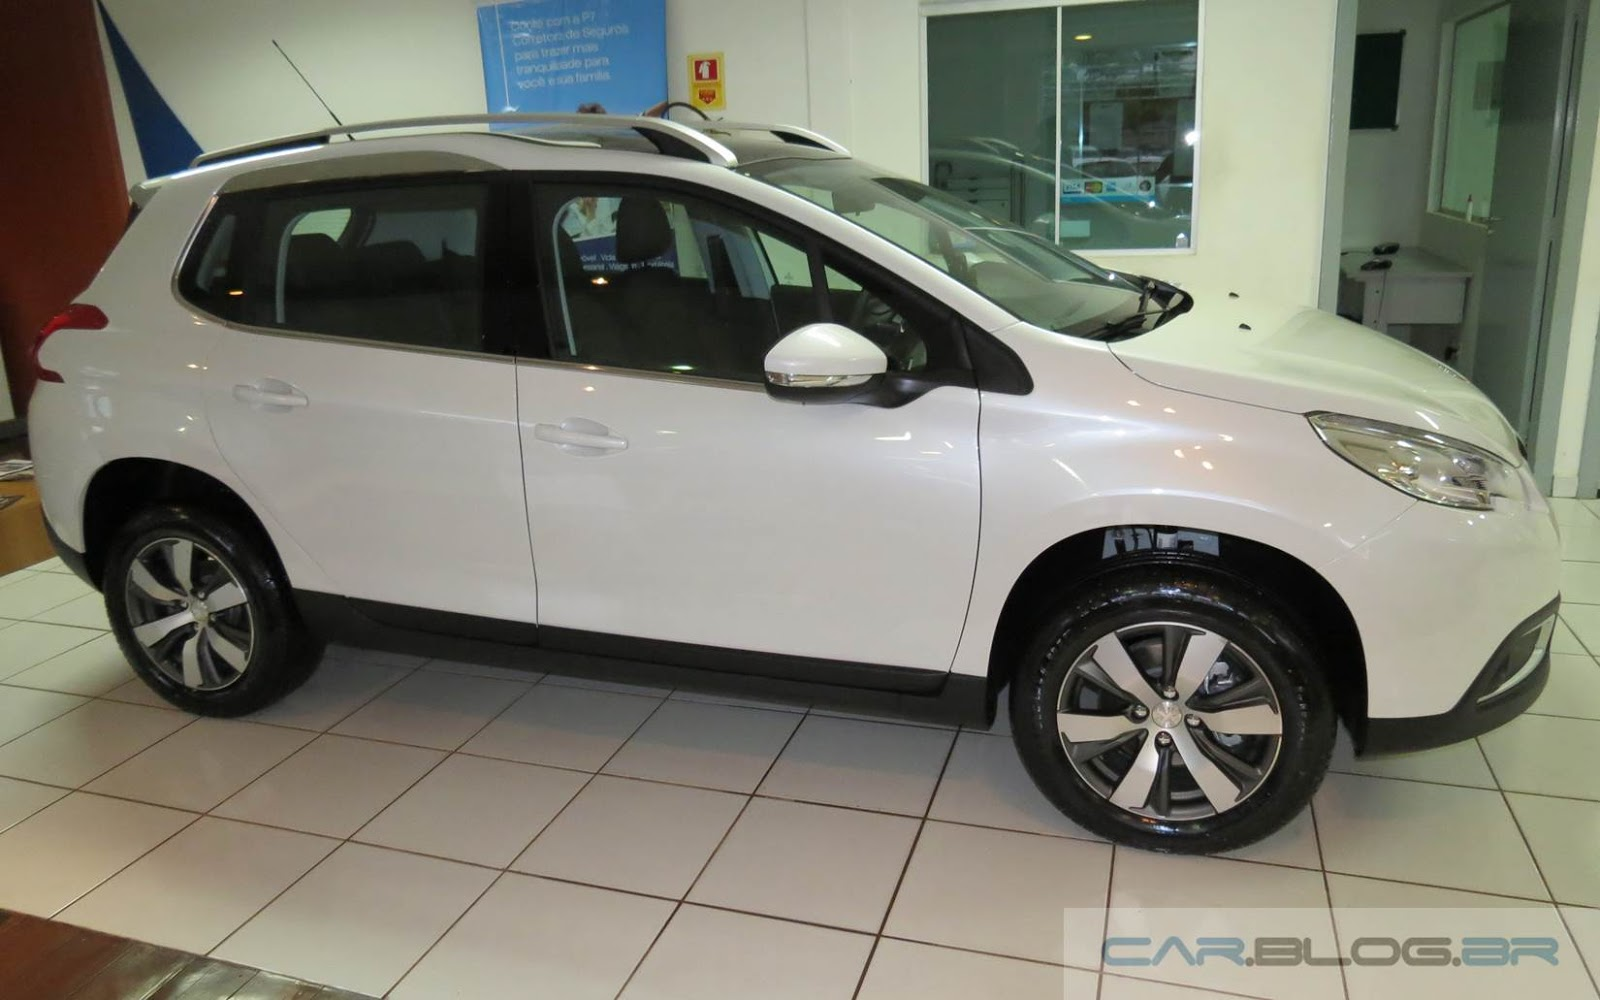 Novo Peugeot 2008 Automático - Branco Nacré